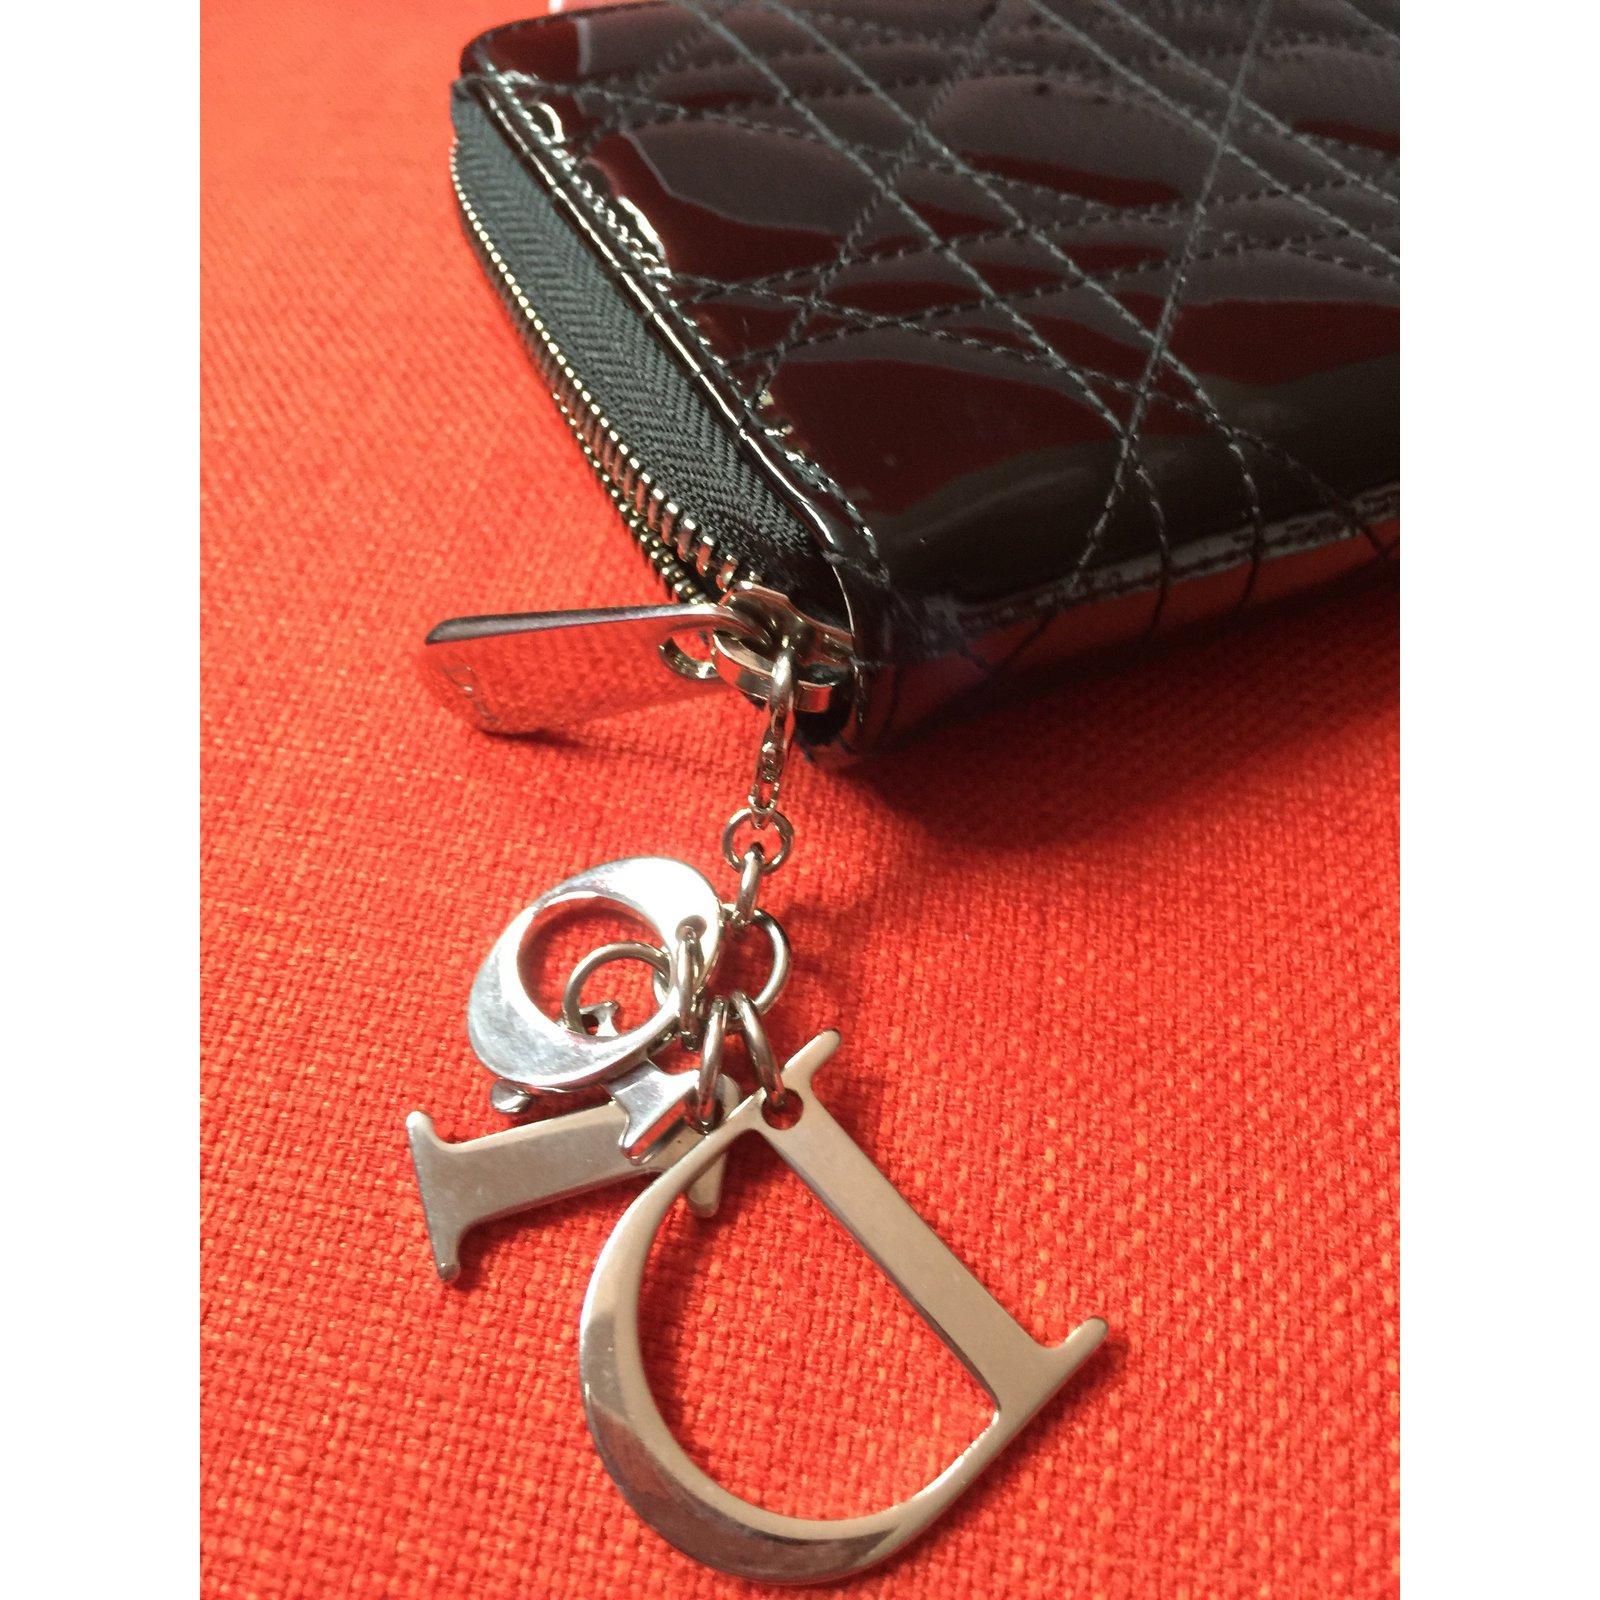 025658be7c6b Petite maroquinerie Dior Portefeuille dior Cuir vernis Noir ref.35291 -  Joli Closet